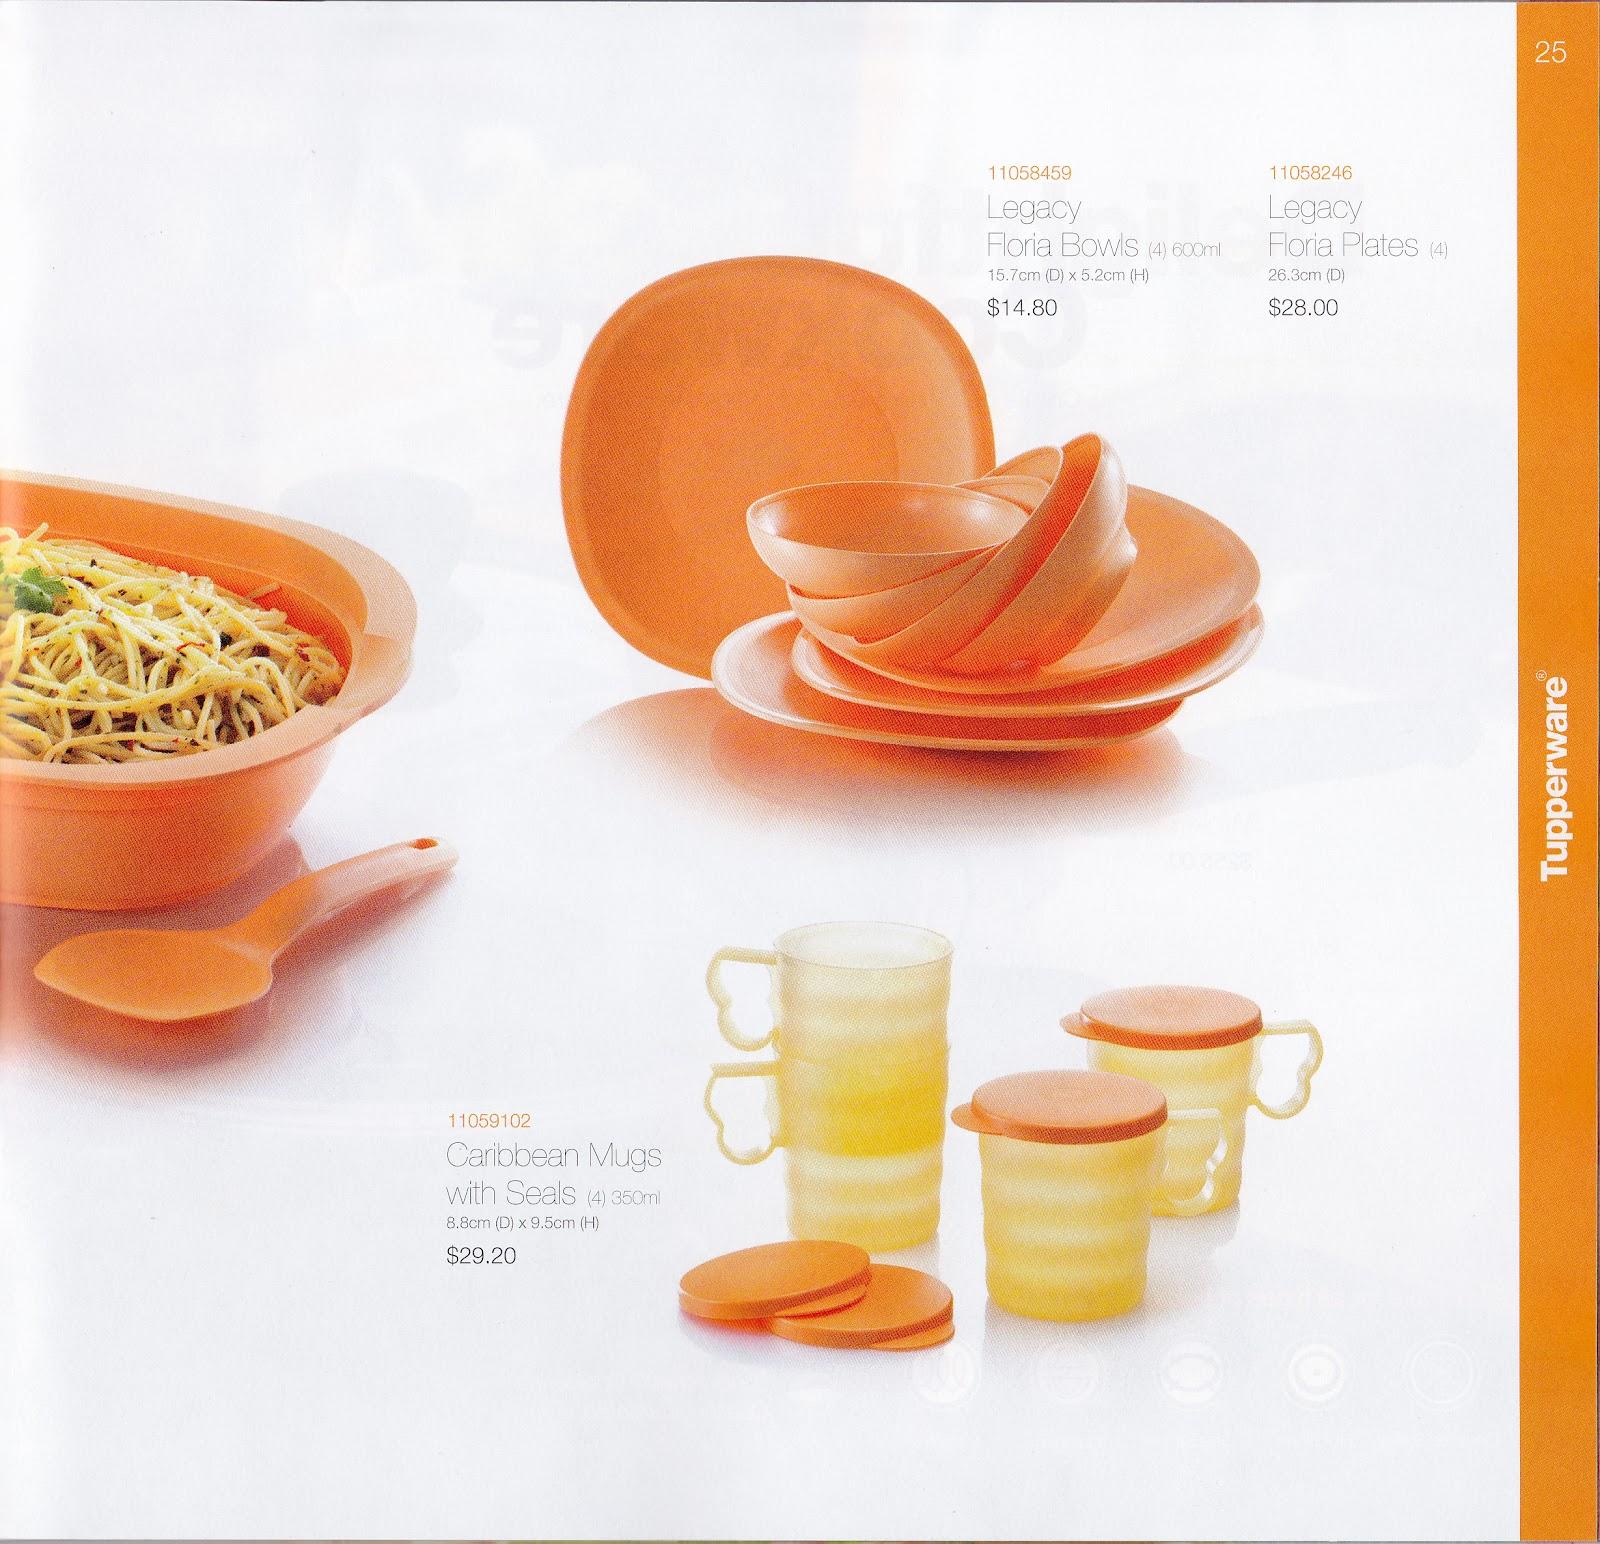 Buy Tupperware in Singapore: Dining Elegance